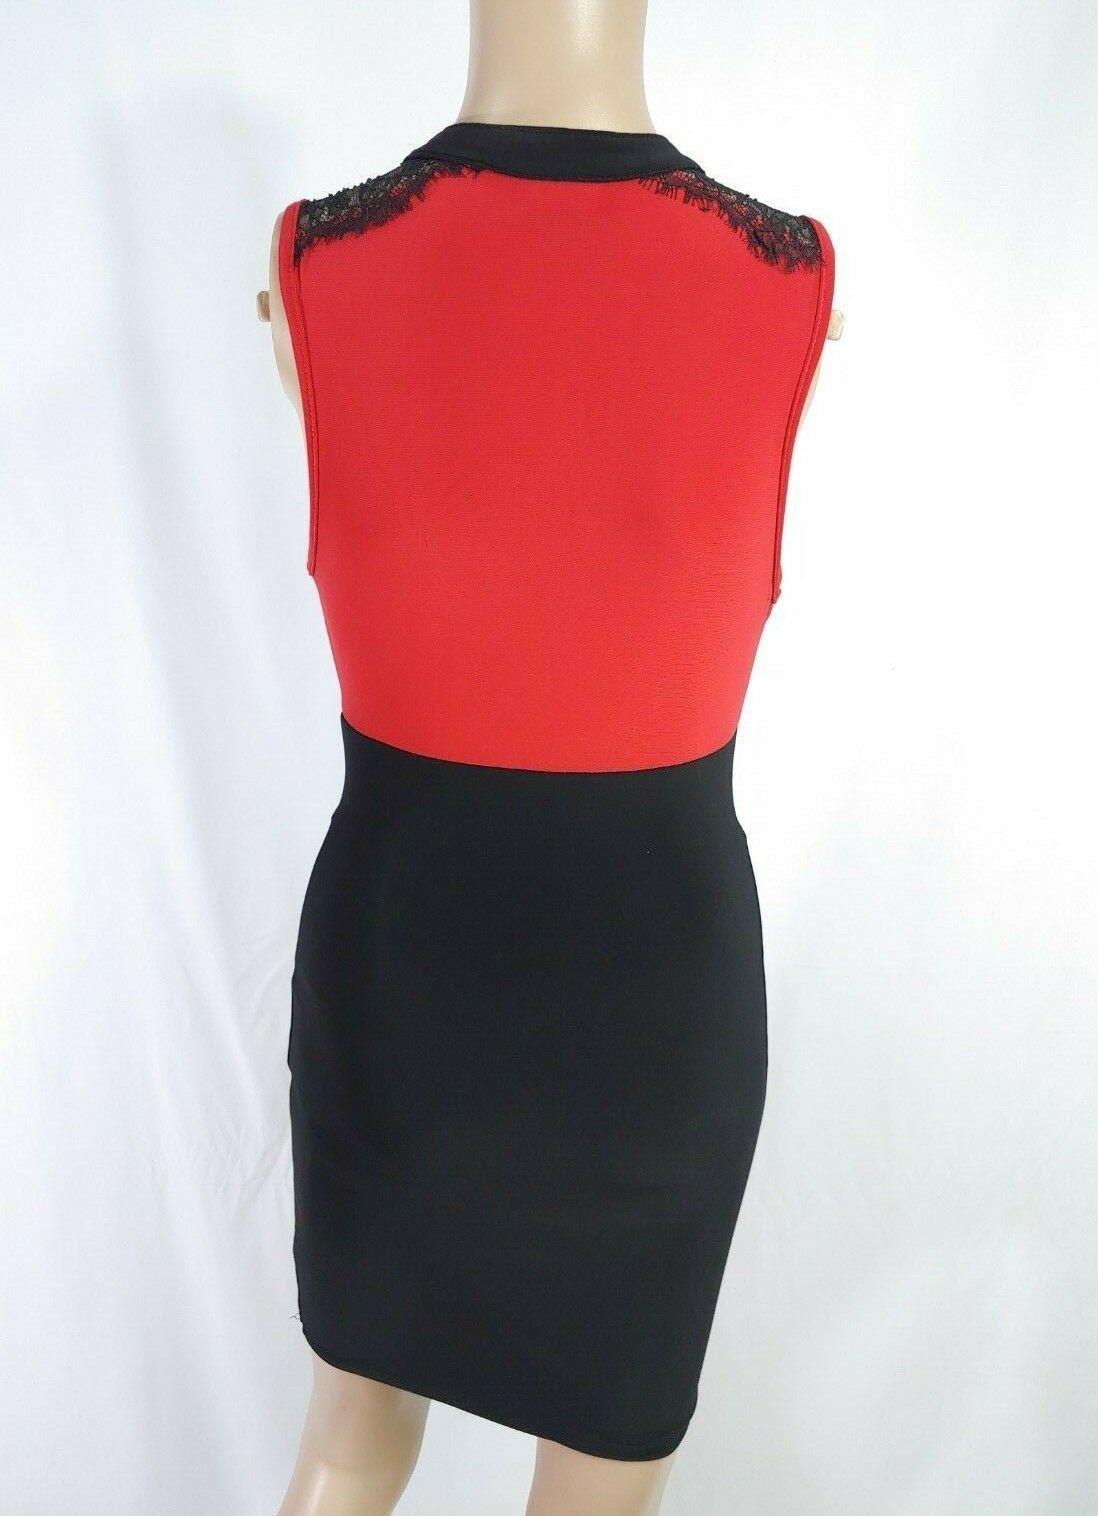 Vtg 90s Red Black Colorblock Keyhole Ascot Lace Trim Wiggle Pinup Sheath Dress S